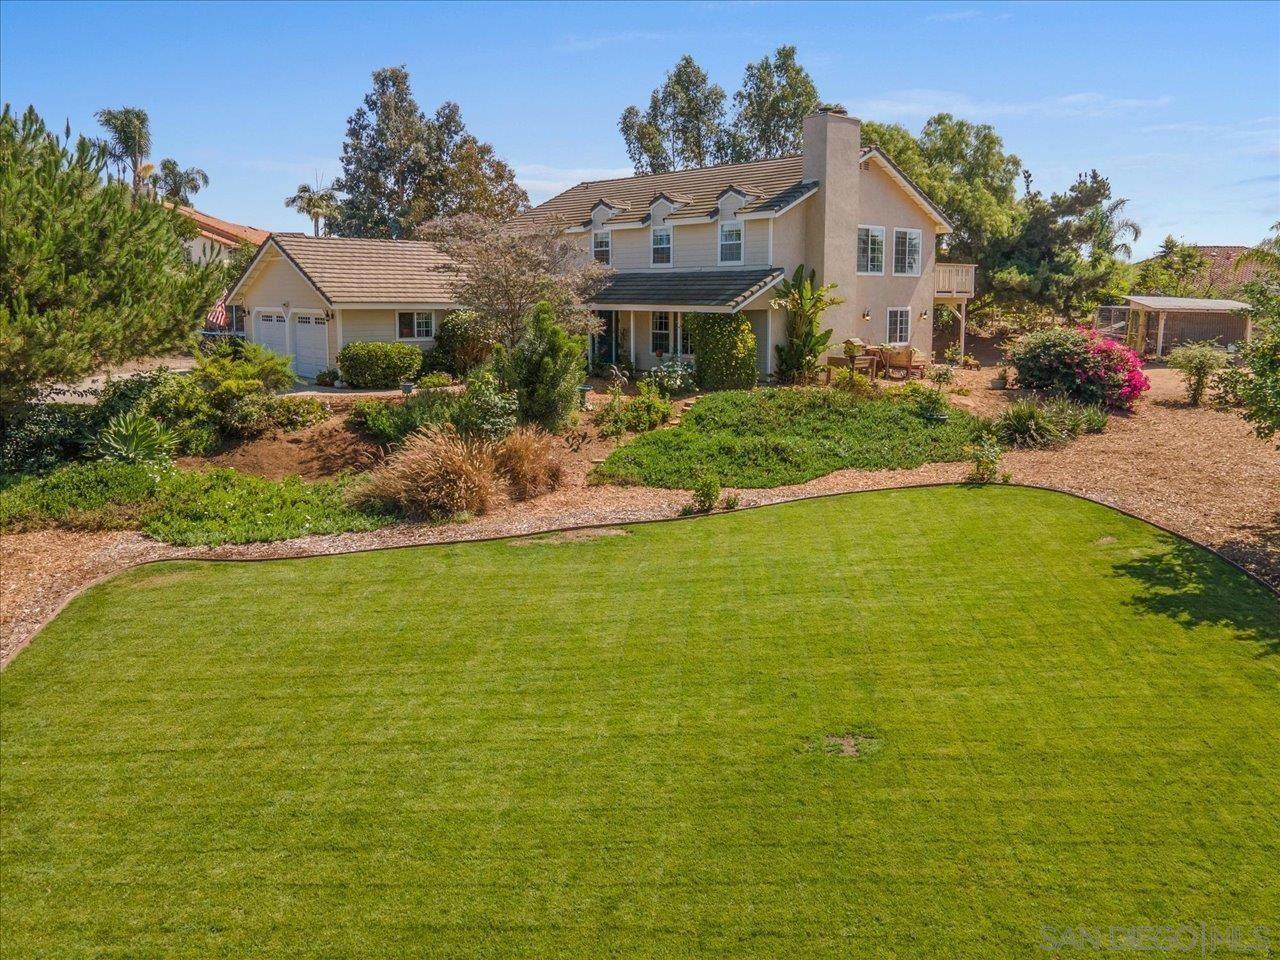 Photo of 1612 Mcdonald Rd, Fallbrook, CA 92028 (MLS # 210026301)